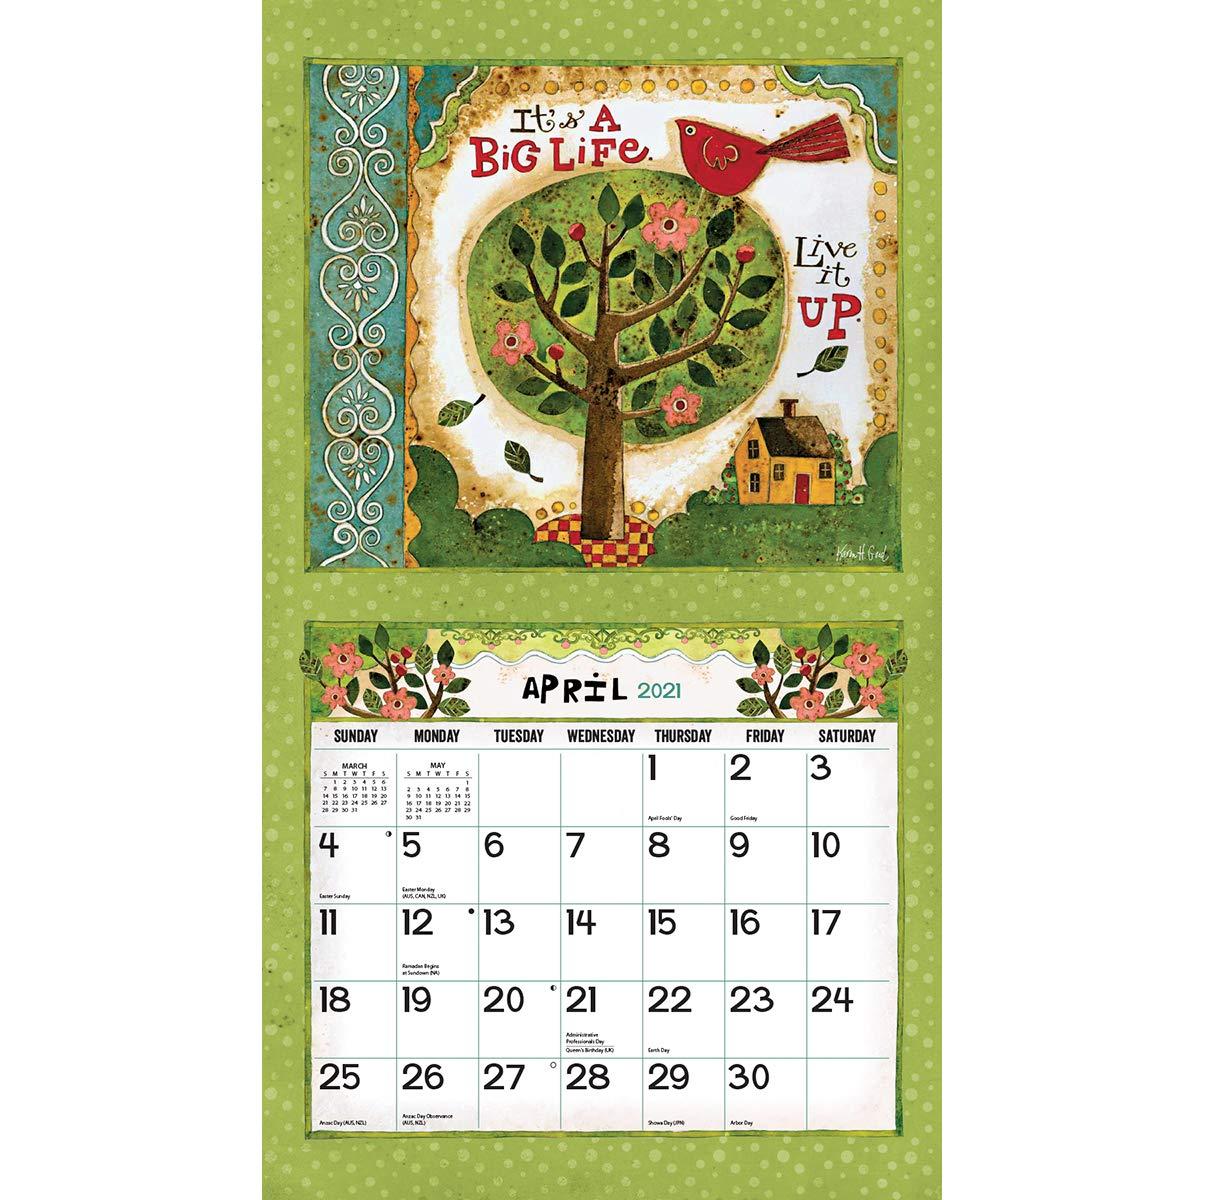 Fiu Calendar 2022.Lang Simple Life 2021 Wall Calendar 21991001879 Amazon Sg Office School Supplies